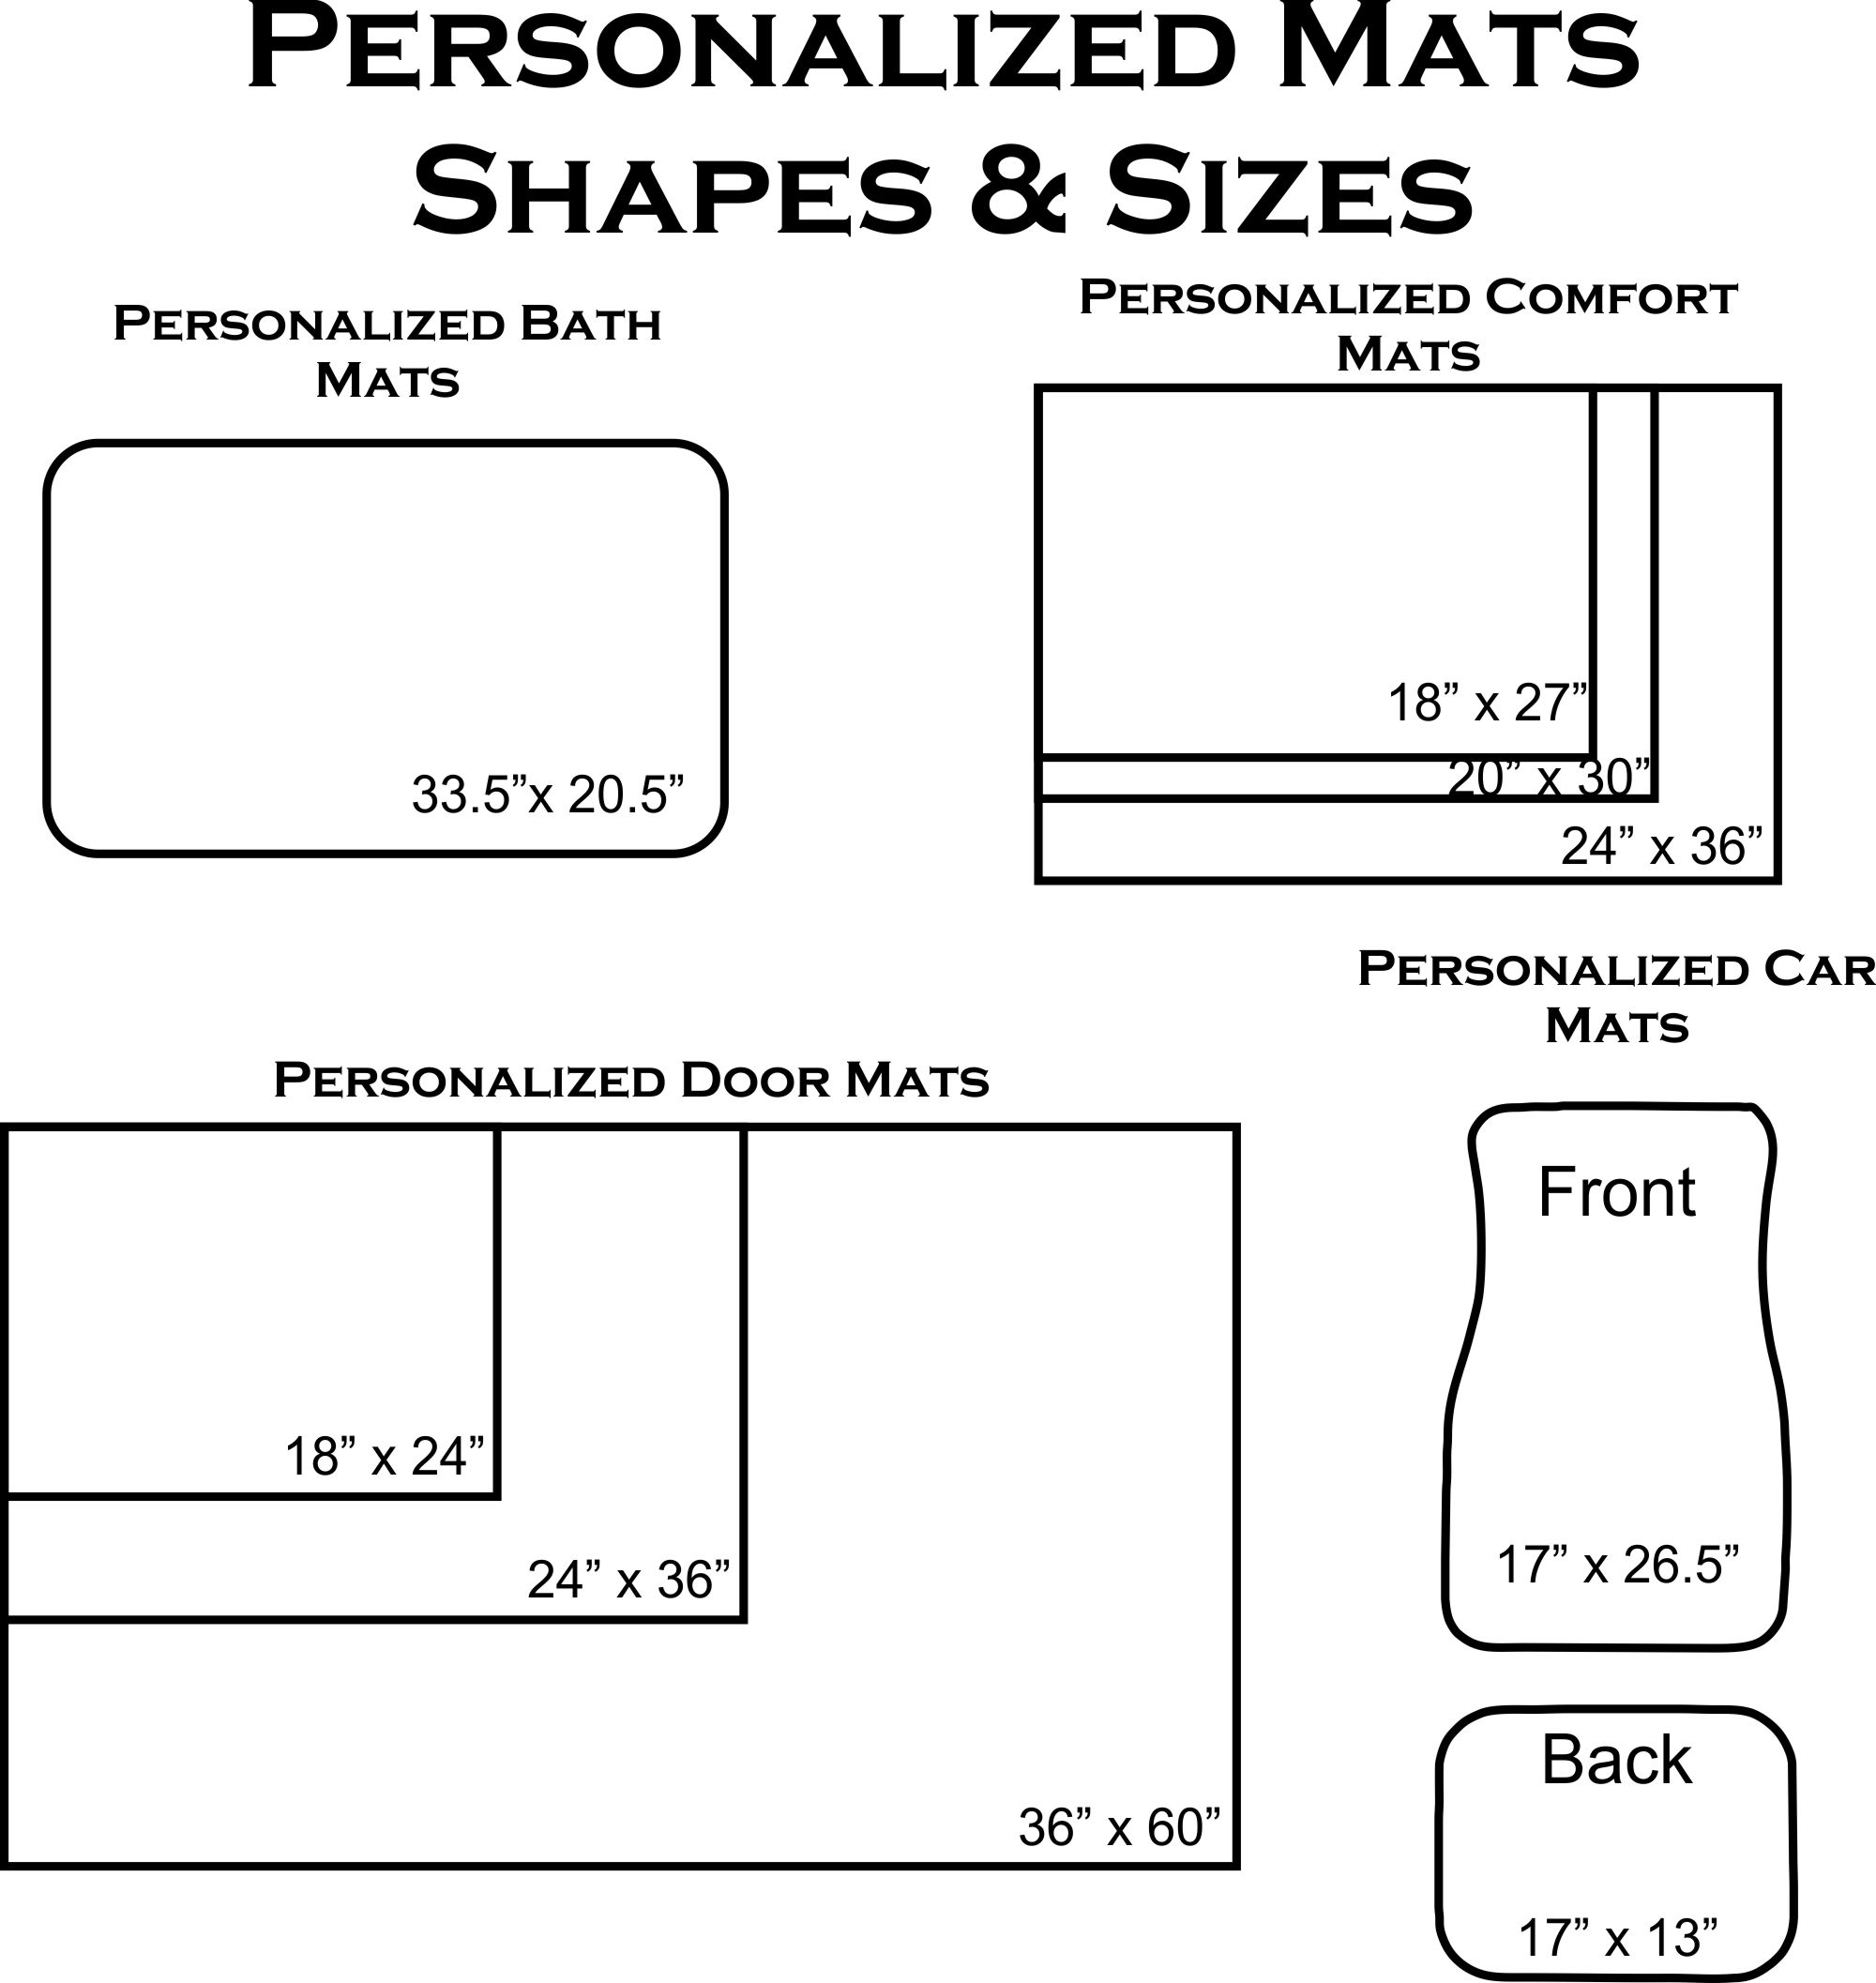 personalized comfort mat